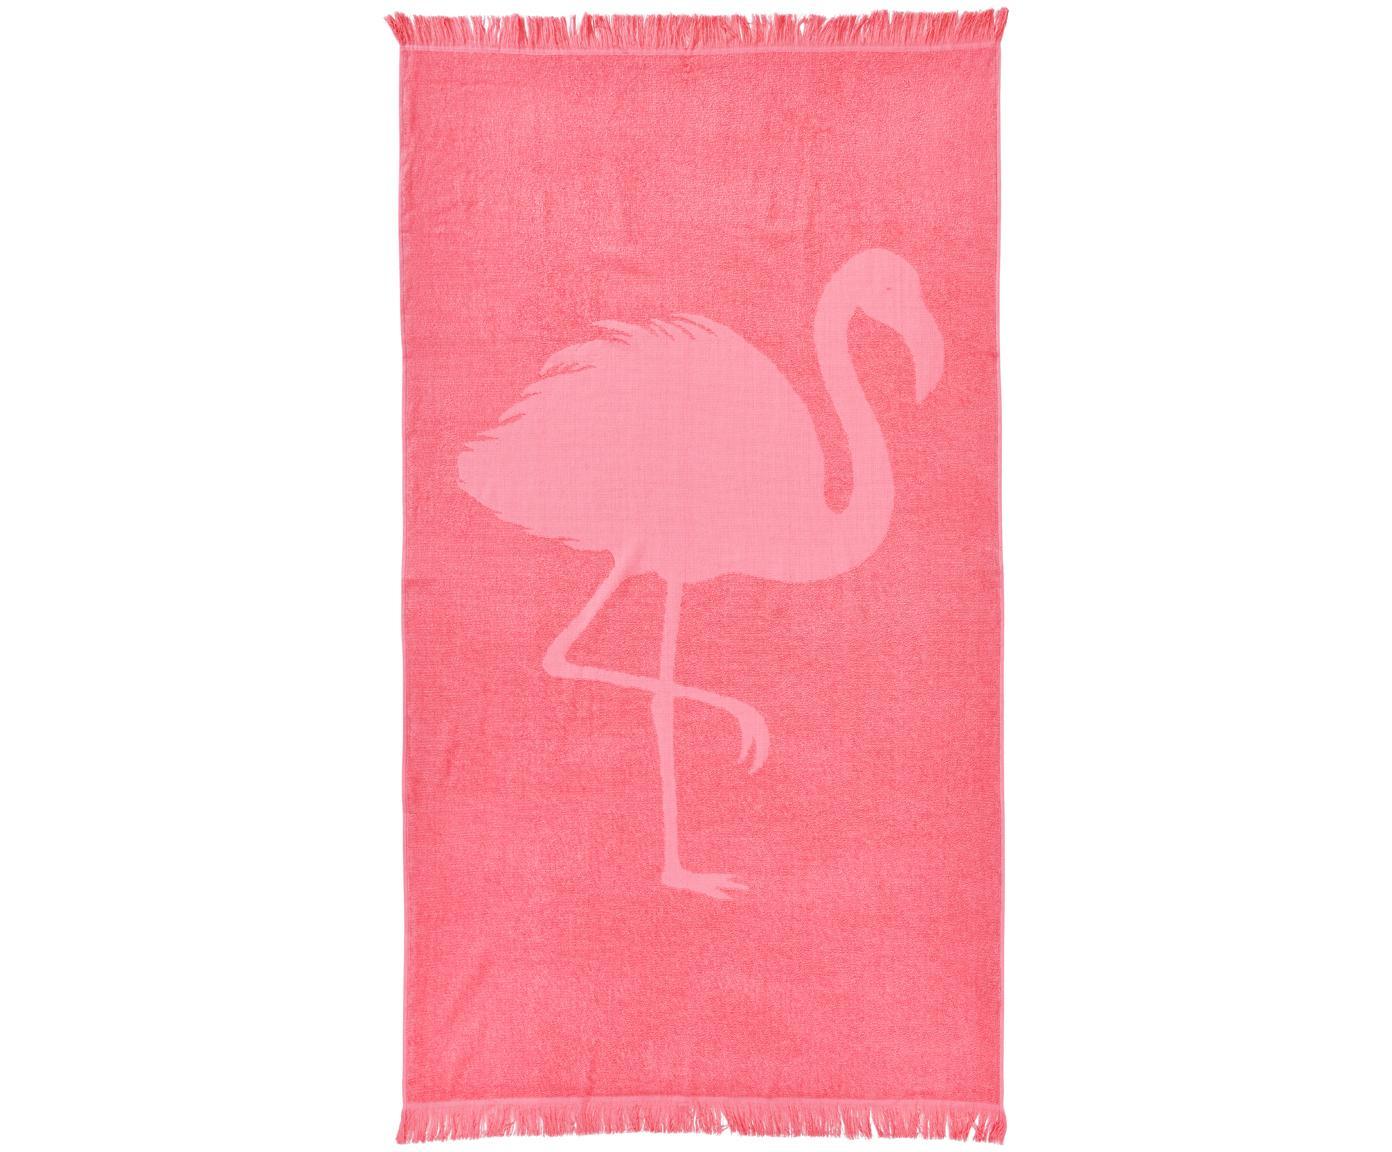 Hamamdoek Capri Flamingo, Katoen, lichte kwaliteit, 300 g/m², Roze, 90 x 160 cm